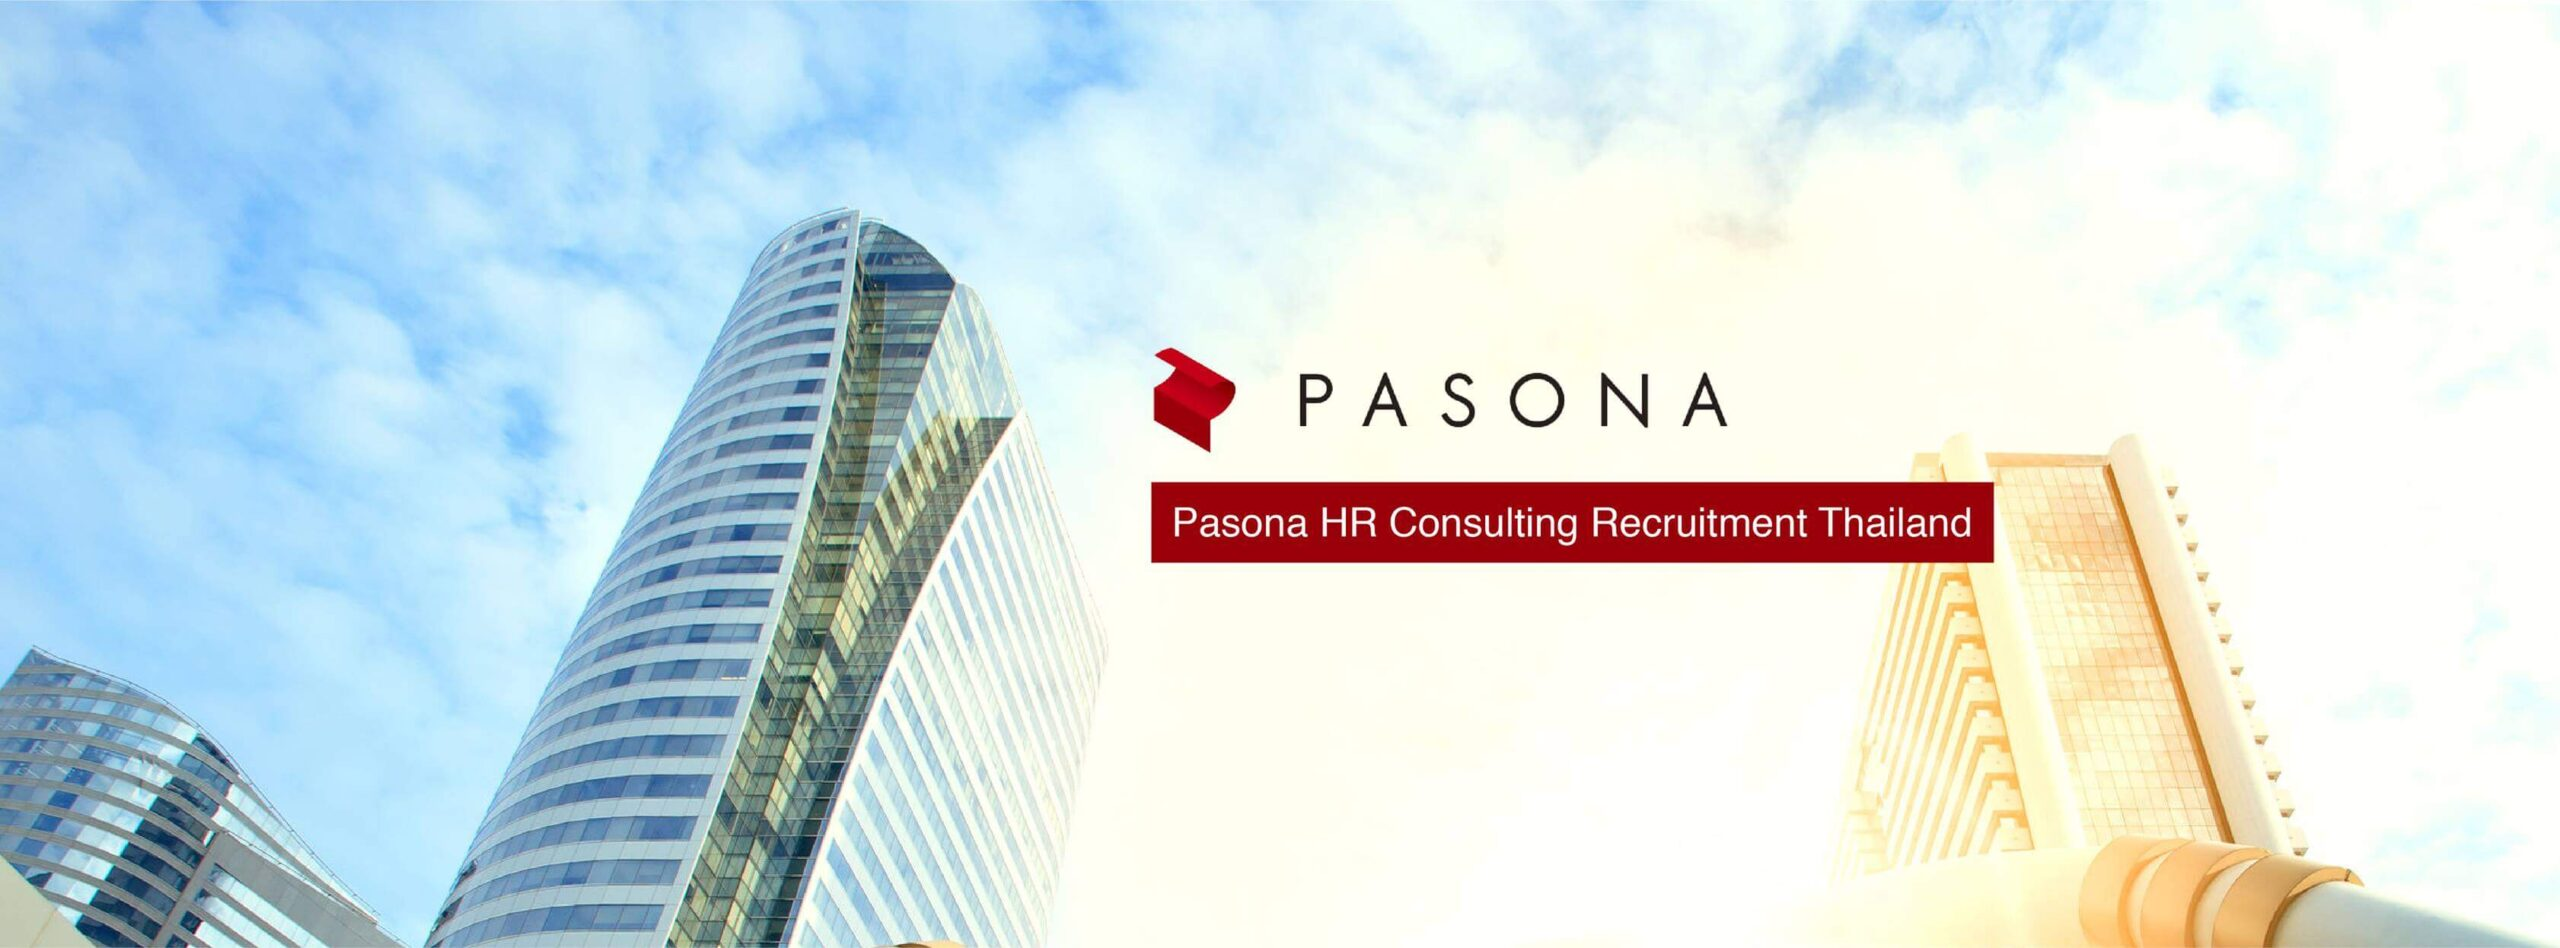 Pasona Recruitment ThailandPasona Recruitment Thailand